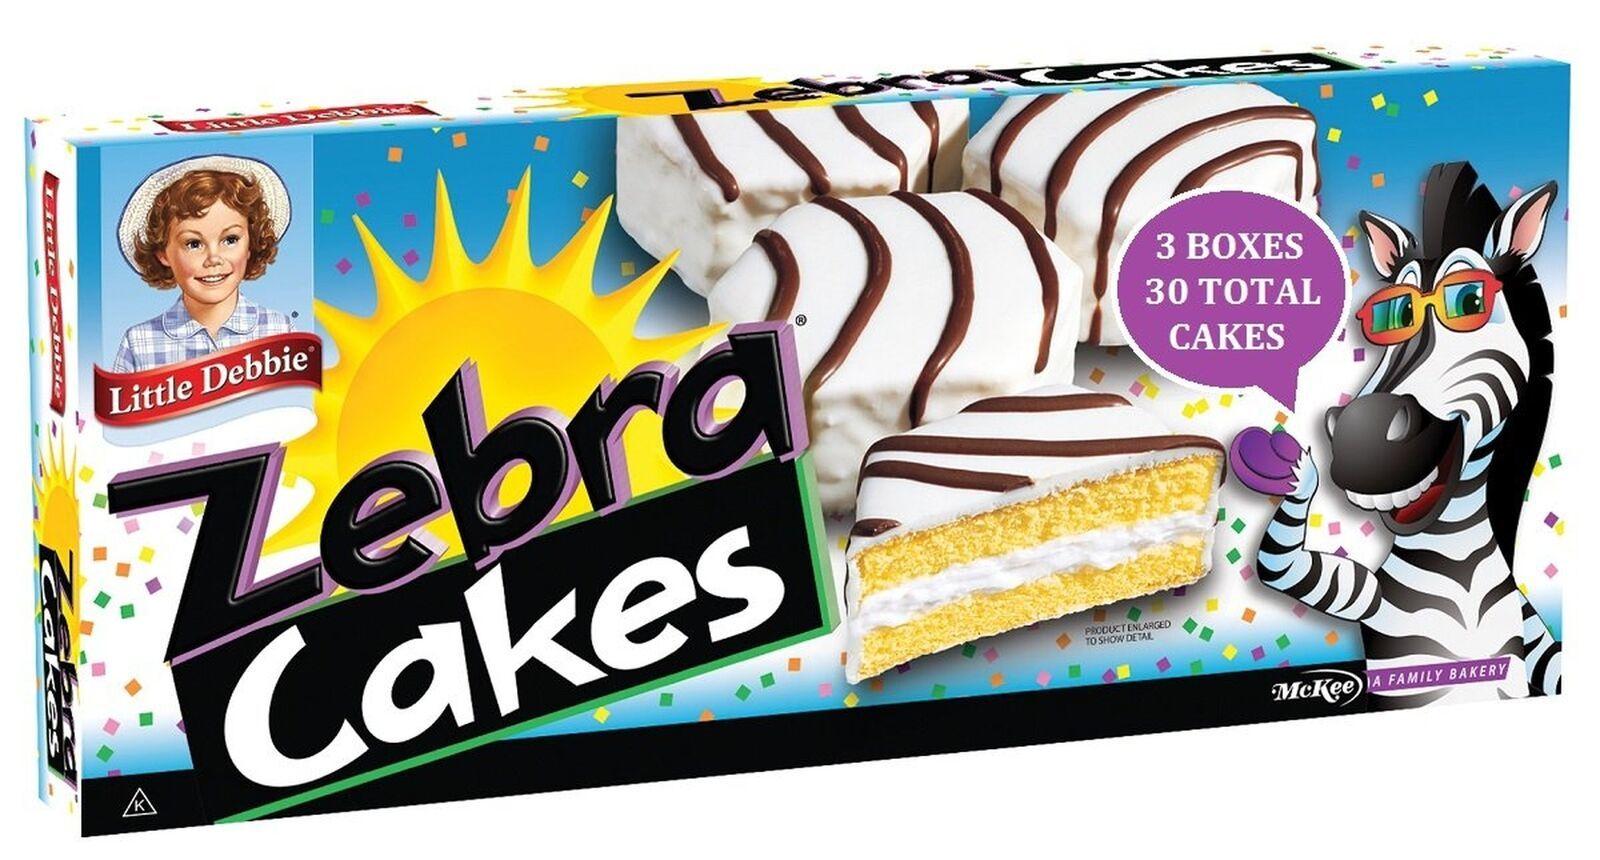 Little Debbie Zebra Cakes 10 Per Box, (3 Pack) - $29.69